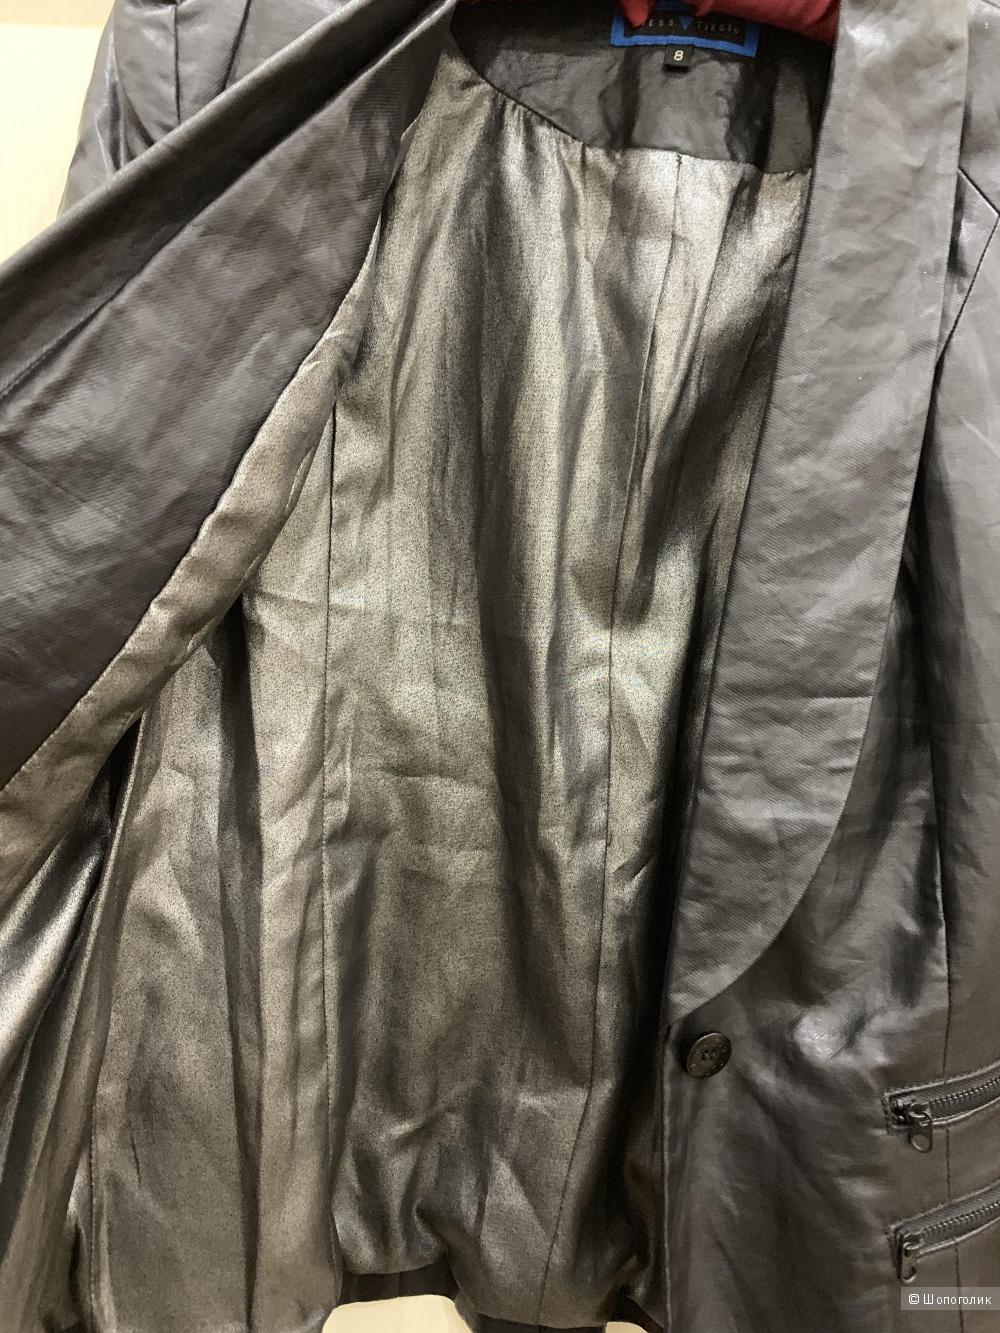 Пиджак Guess tiesto, размер 8(44-46)